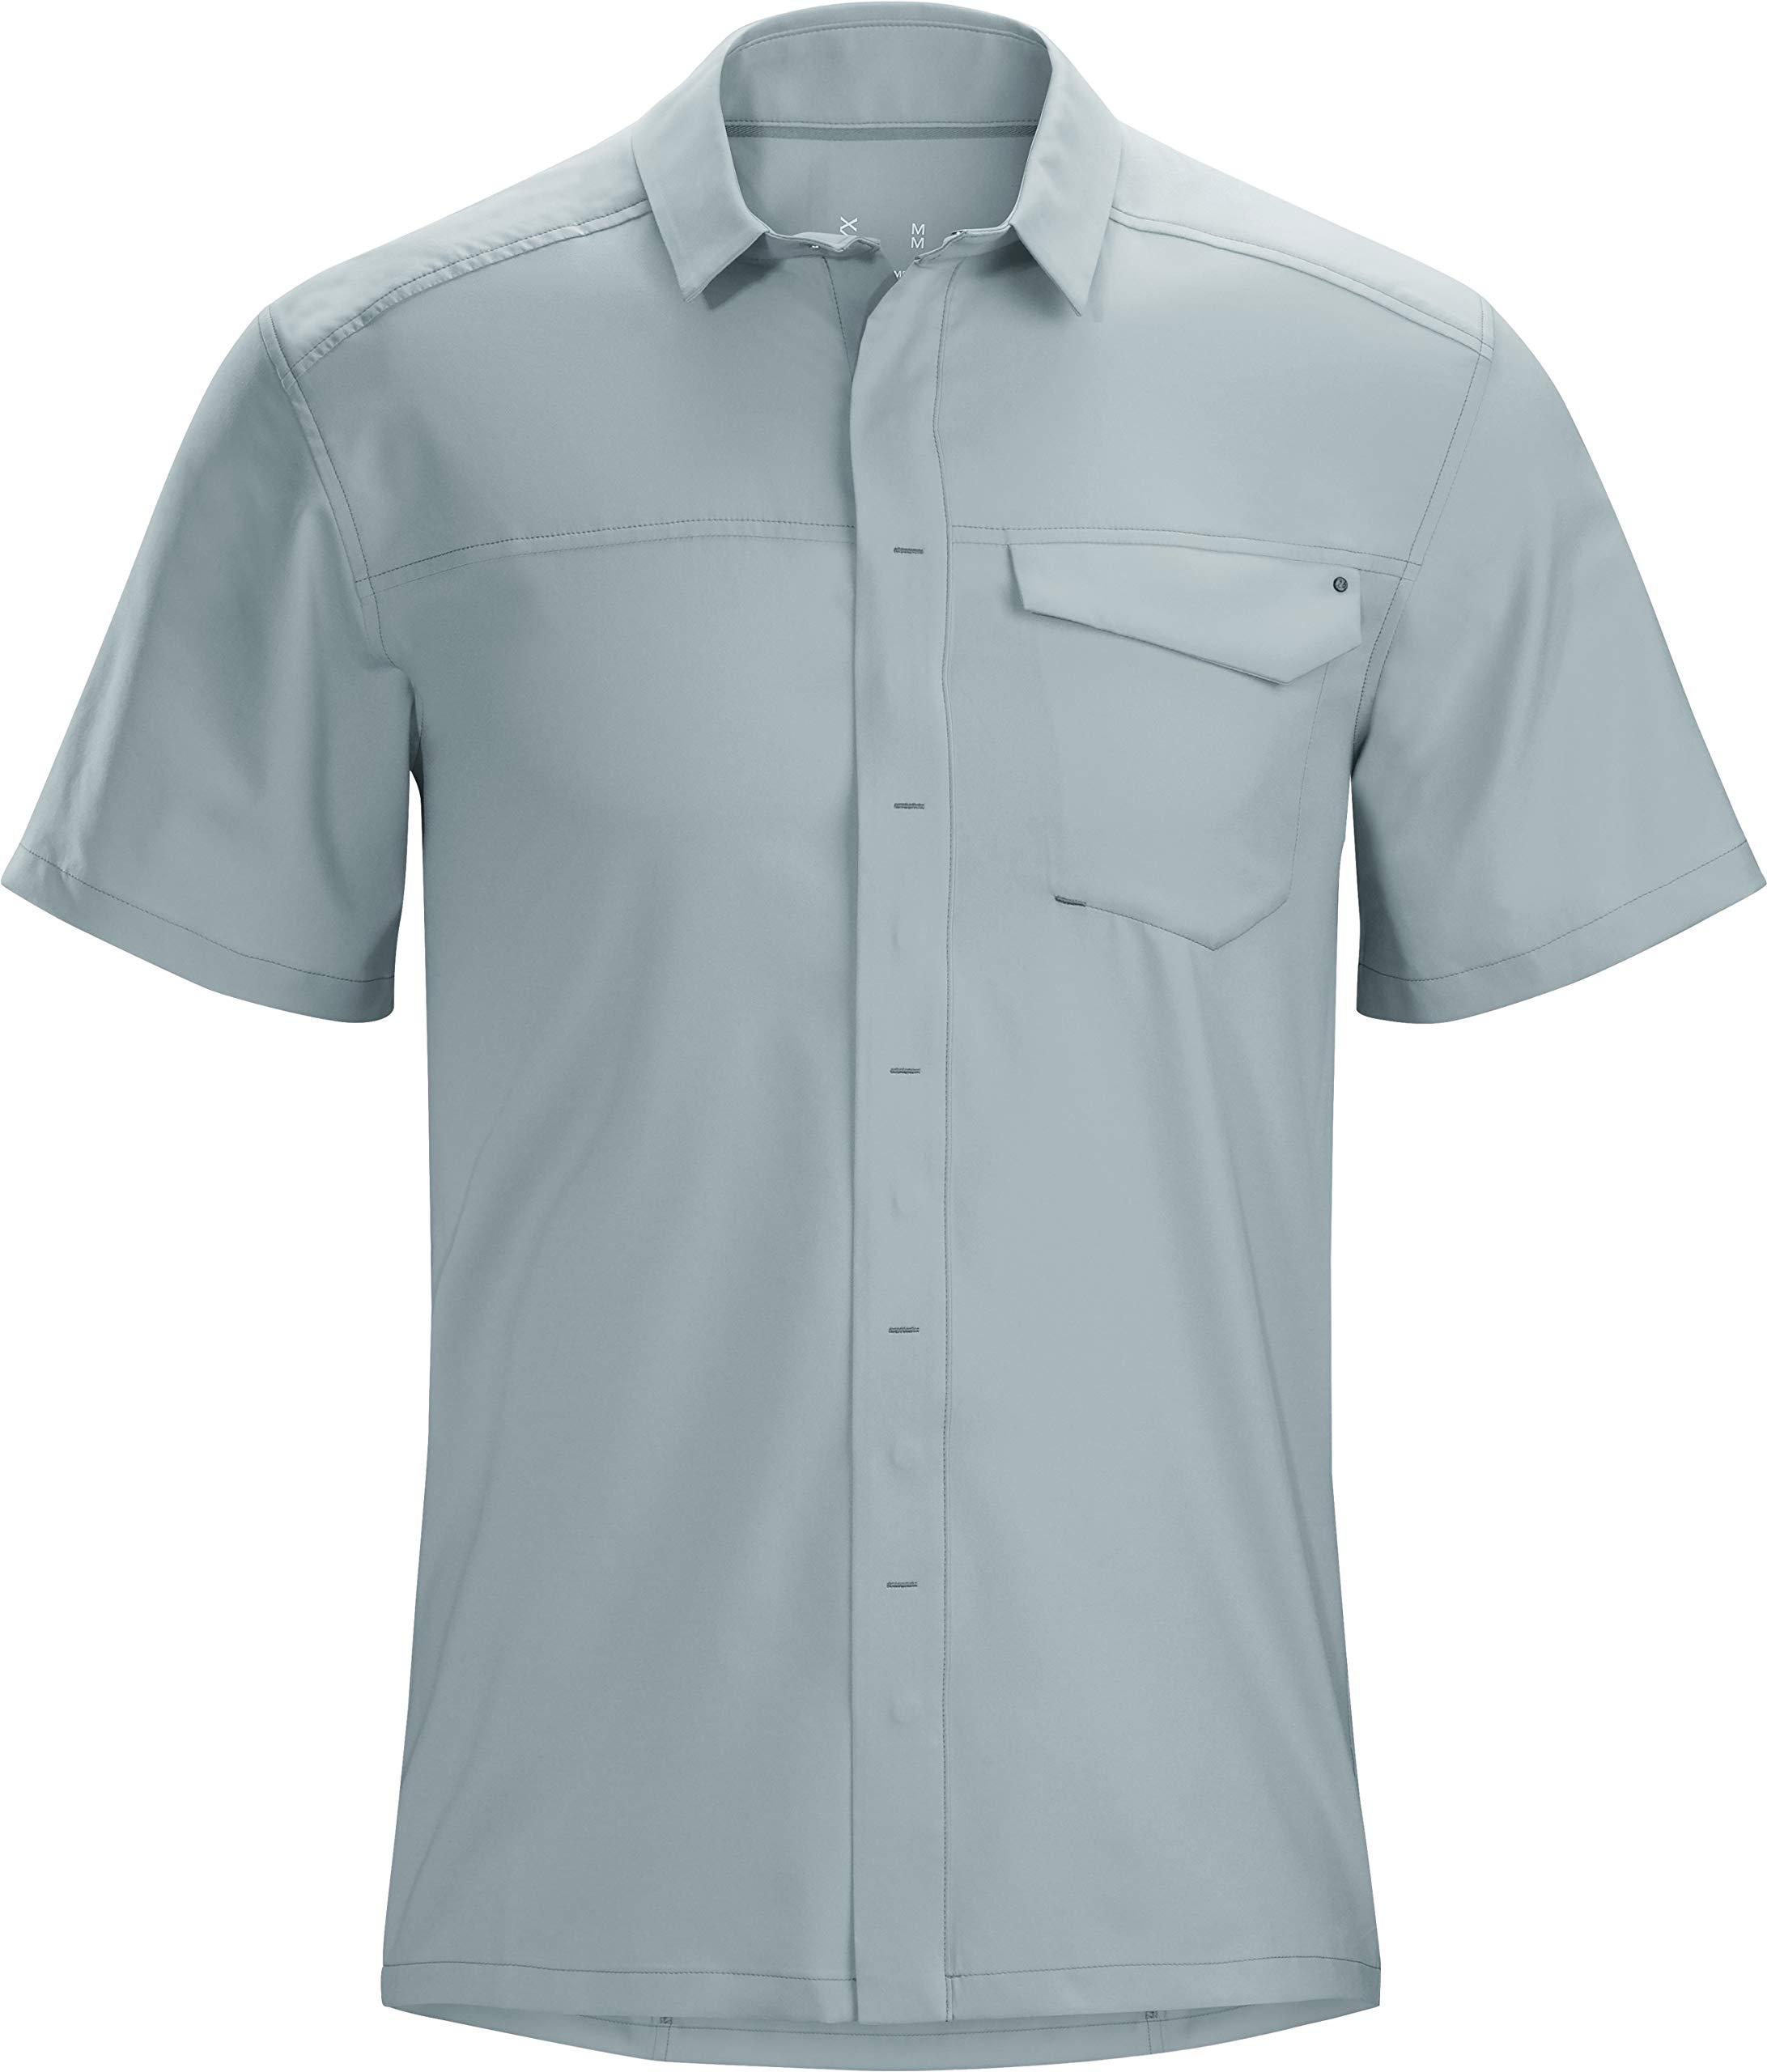 Arc'teryx Skyline SS Shirt Men's (Robotica, Small)